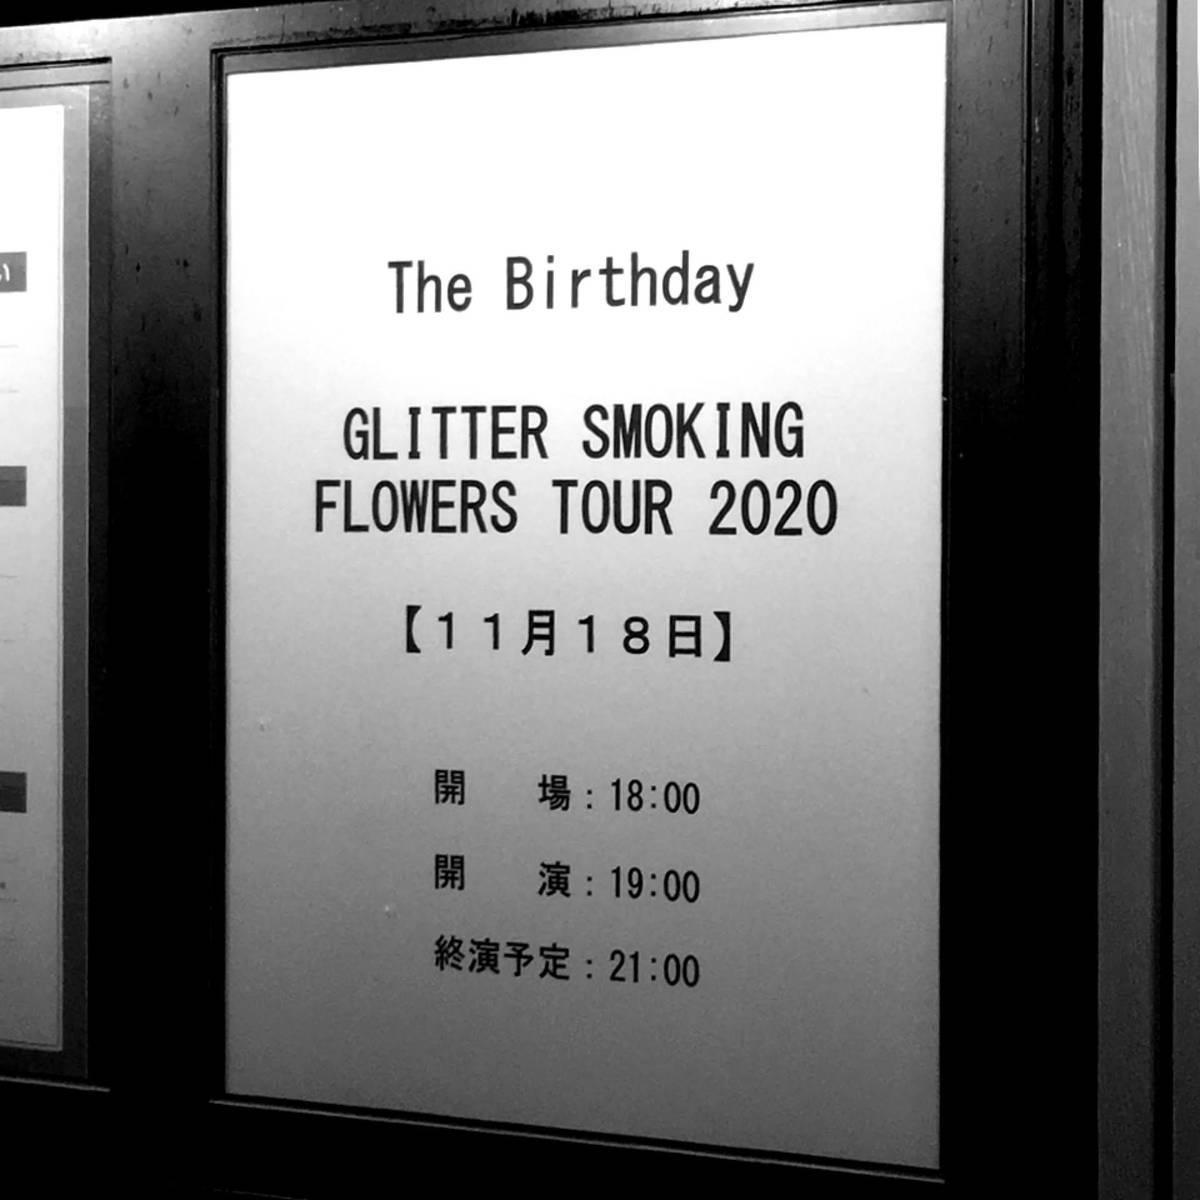 GLITTER SMOKING FLOWERS TOUR 2020